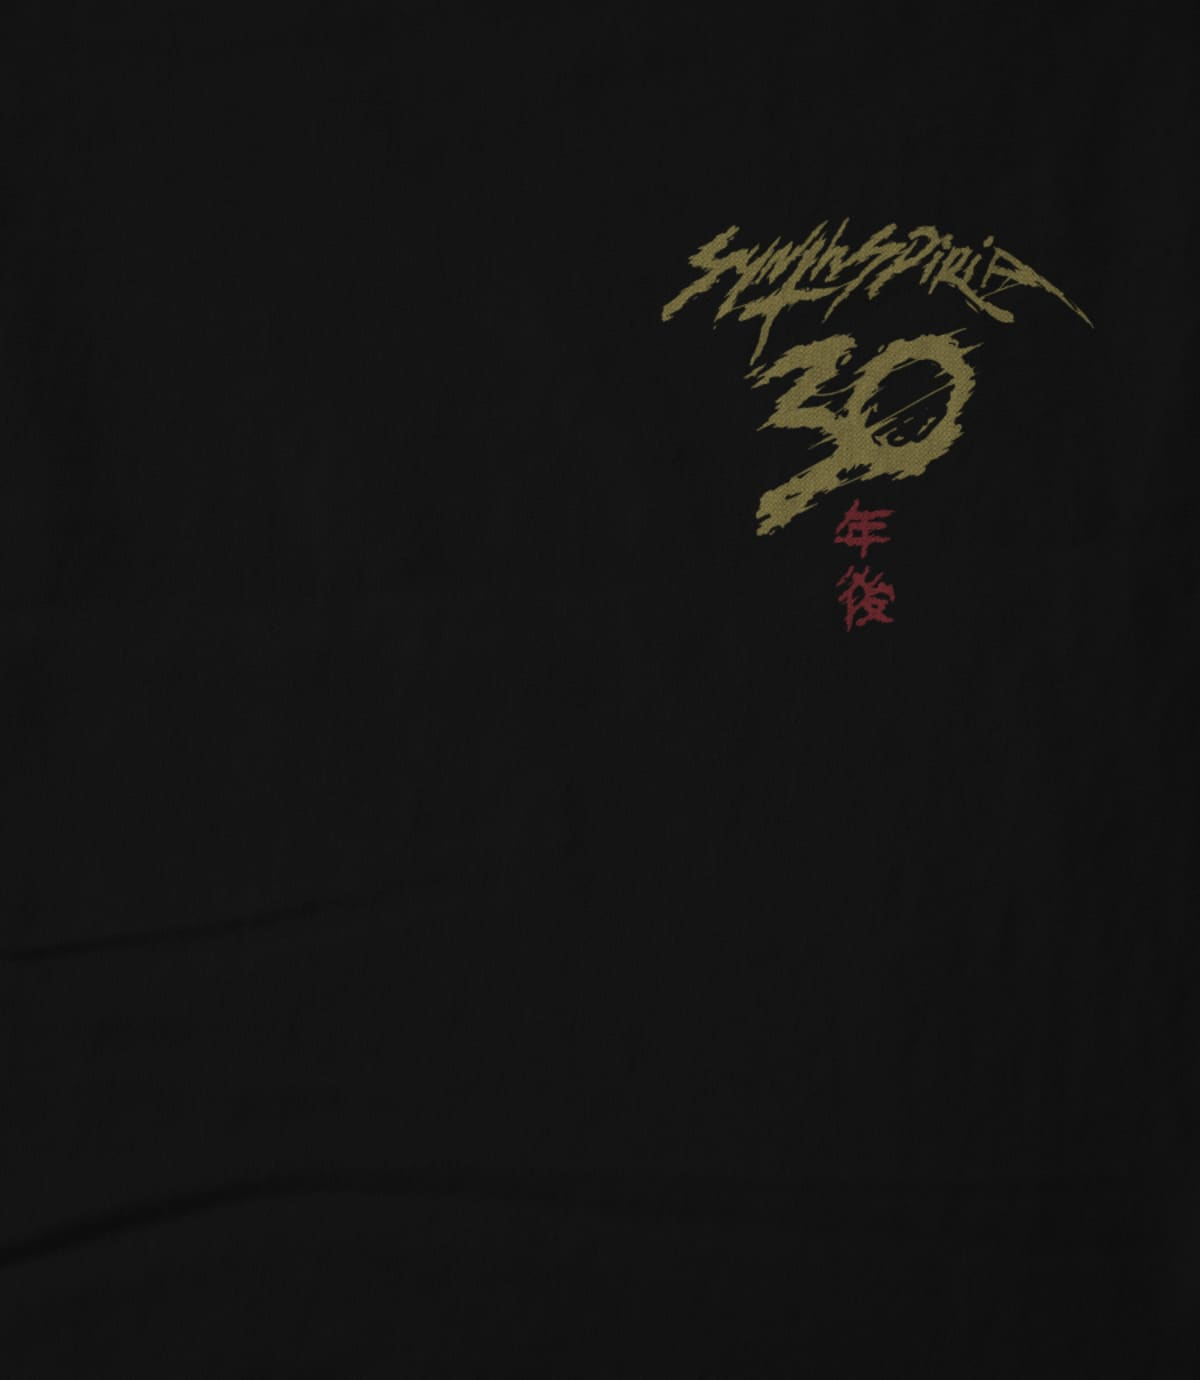 Synthspiria 30 years later  1544295386